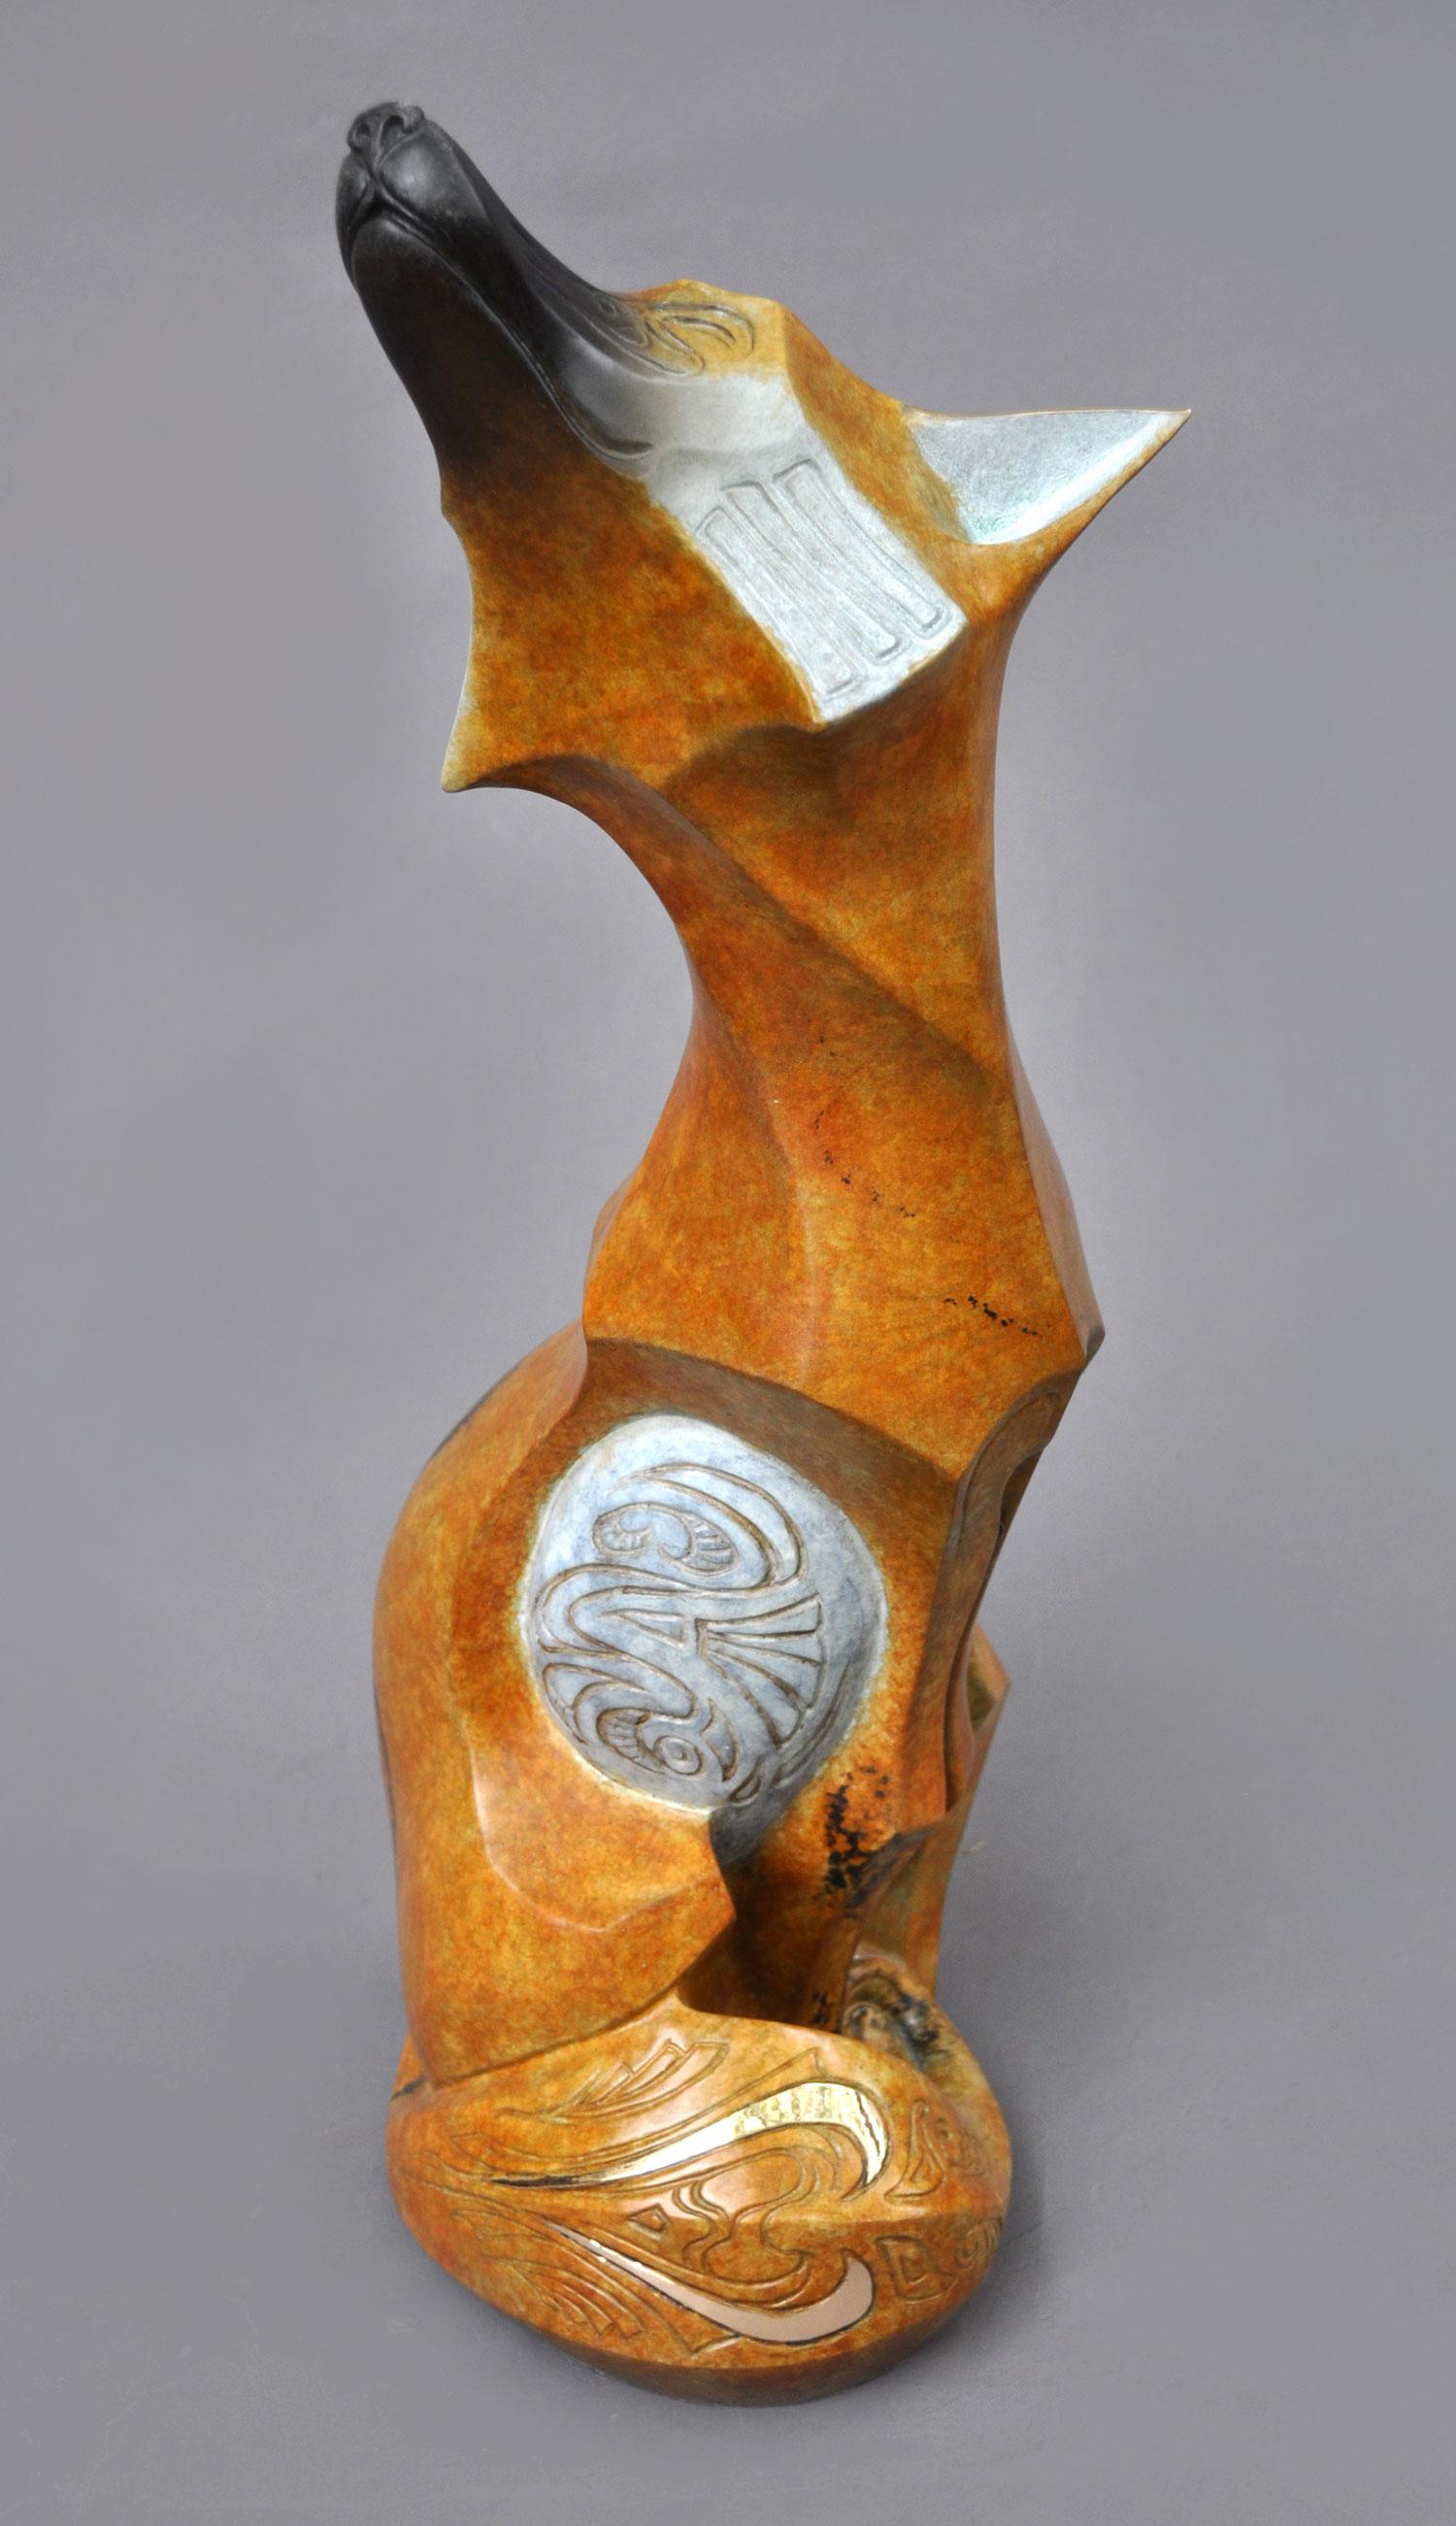 bronze-fox-sculpture-churro-john-maisano-6.jpg